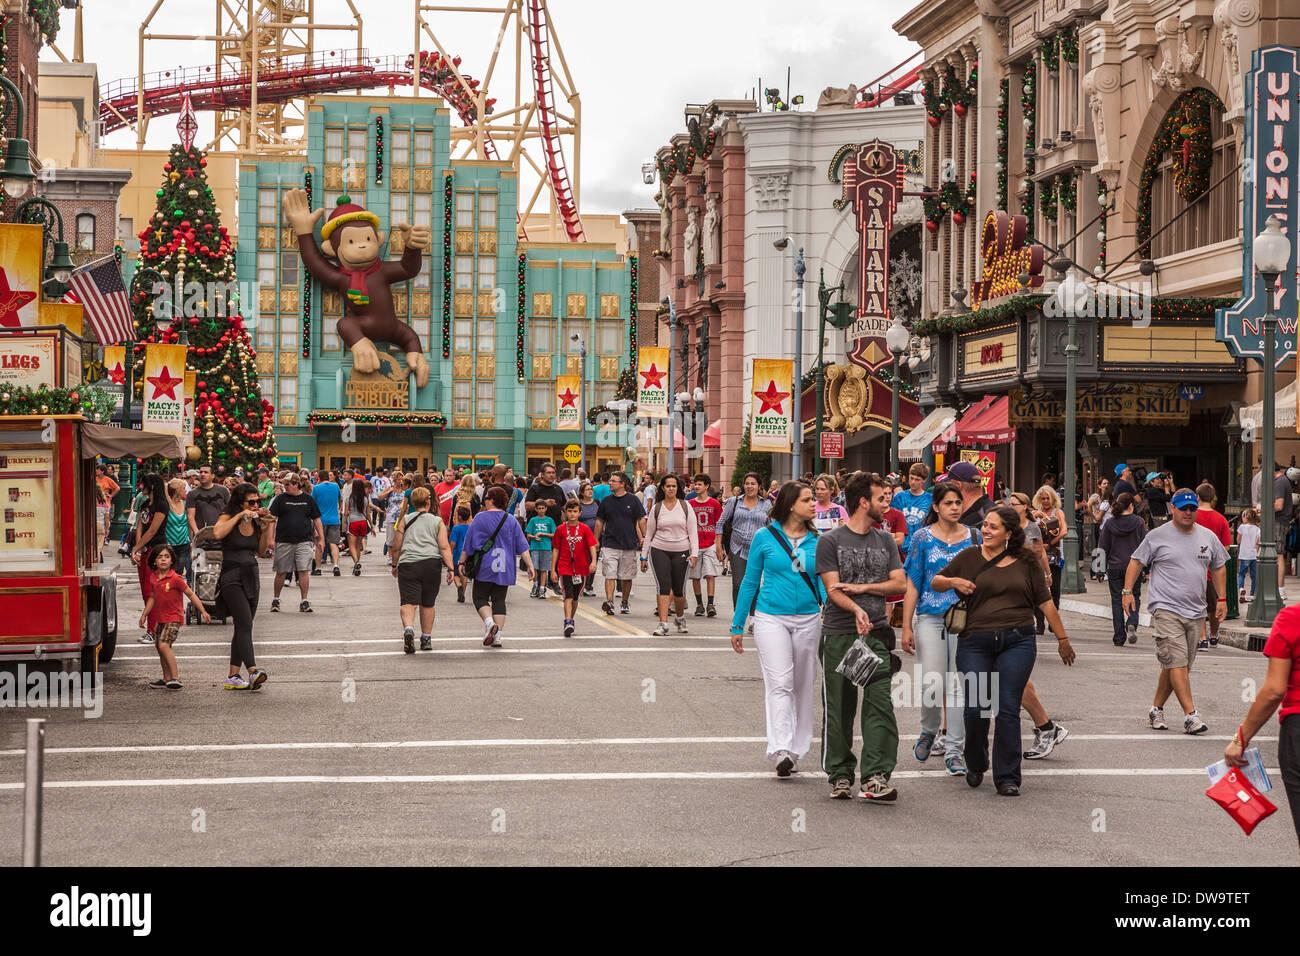 Christmas At Universal Studios Orlando.Crowded City Street During Christmas Holidays At Universal